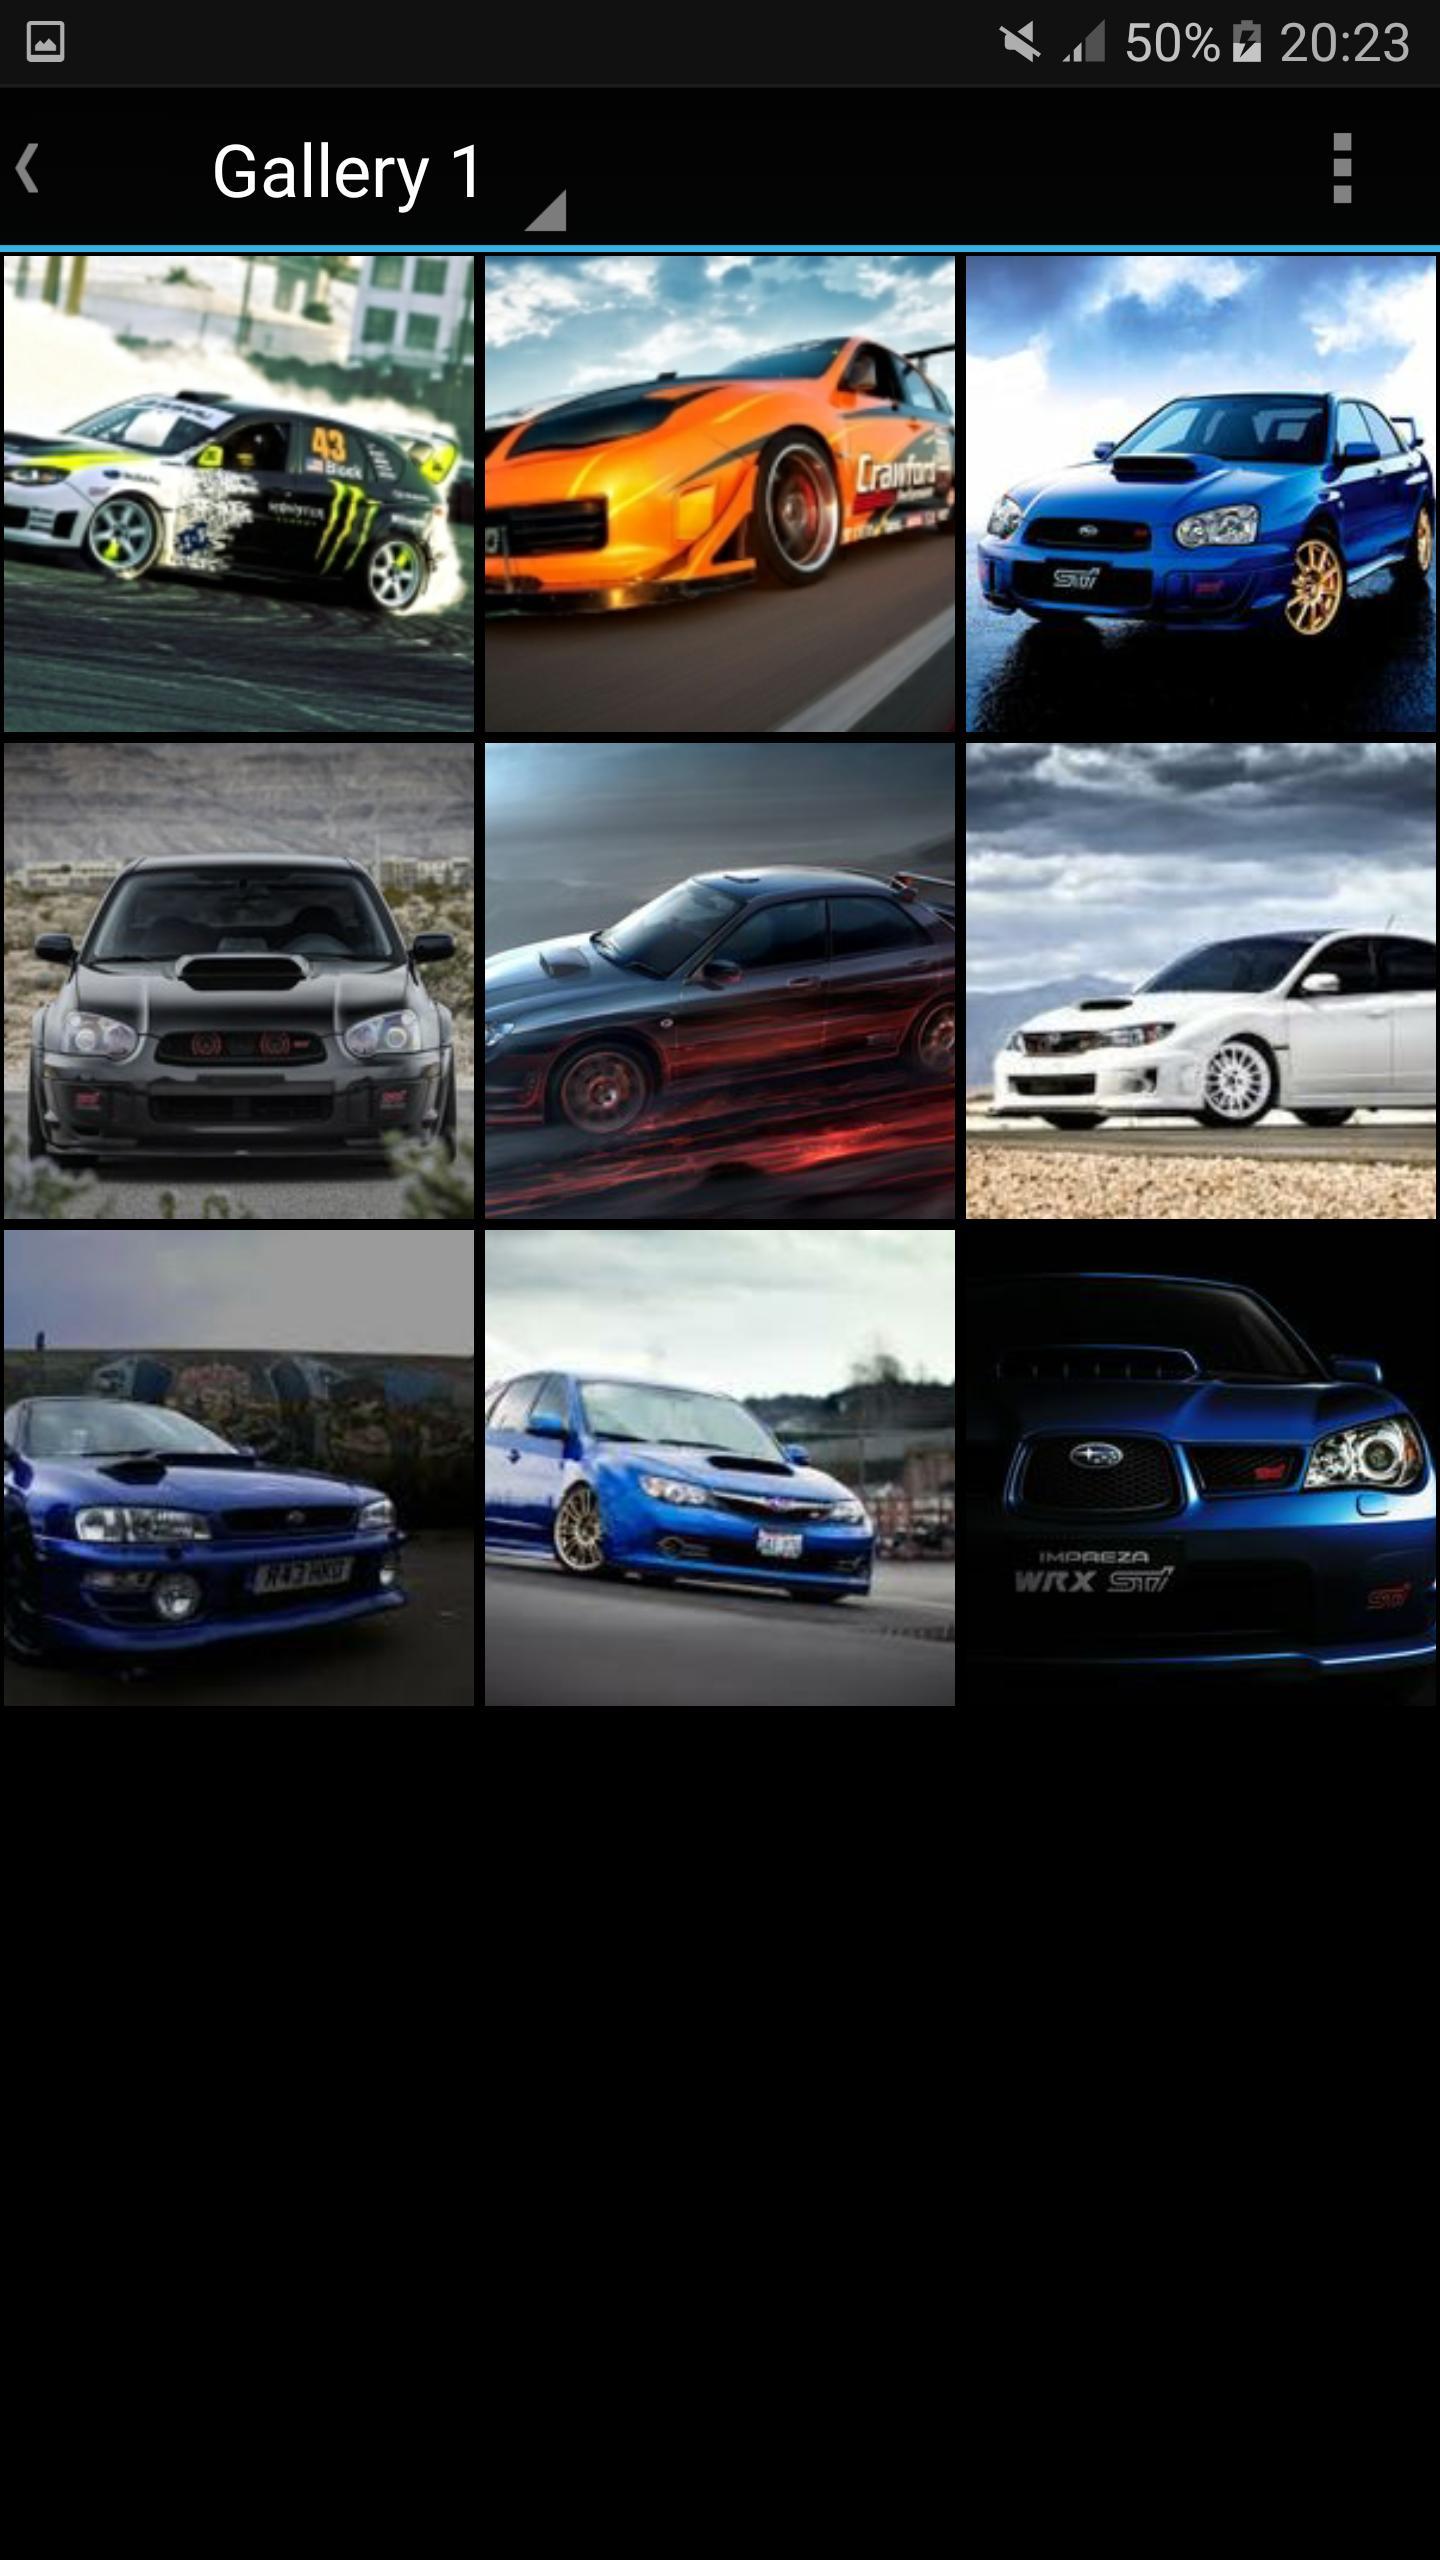 Modified Subaru poster